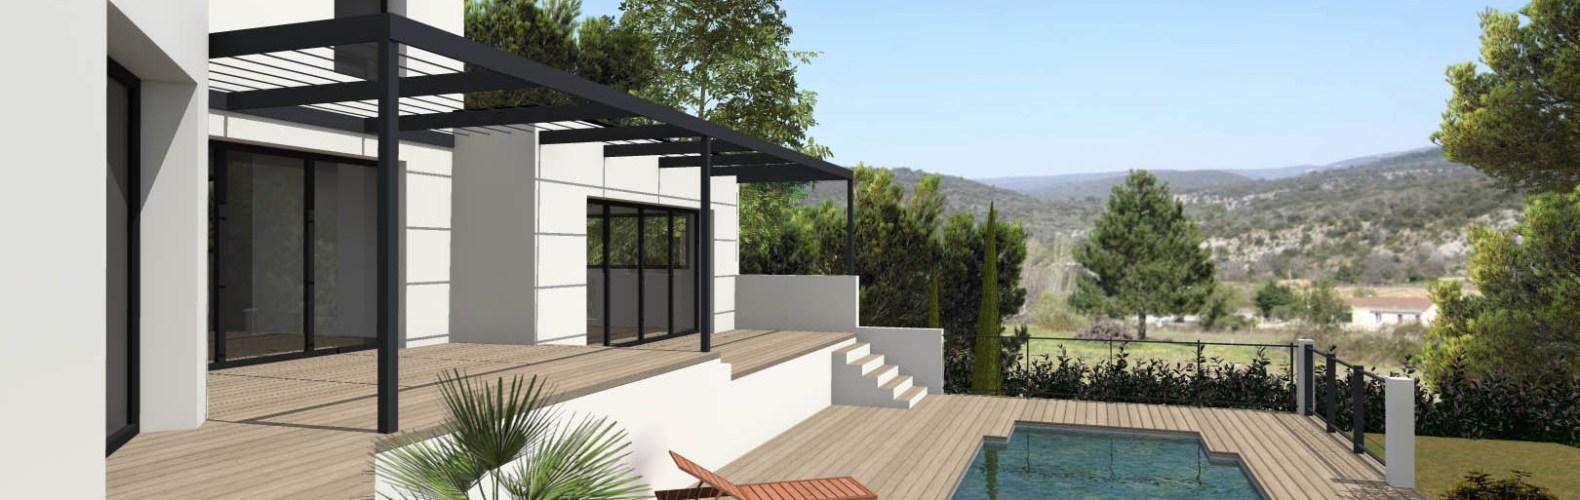 Methamis 84 Villa contemporaine_ Atoutplans Architecture